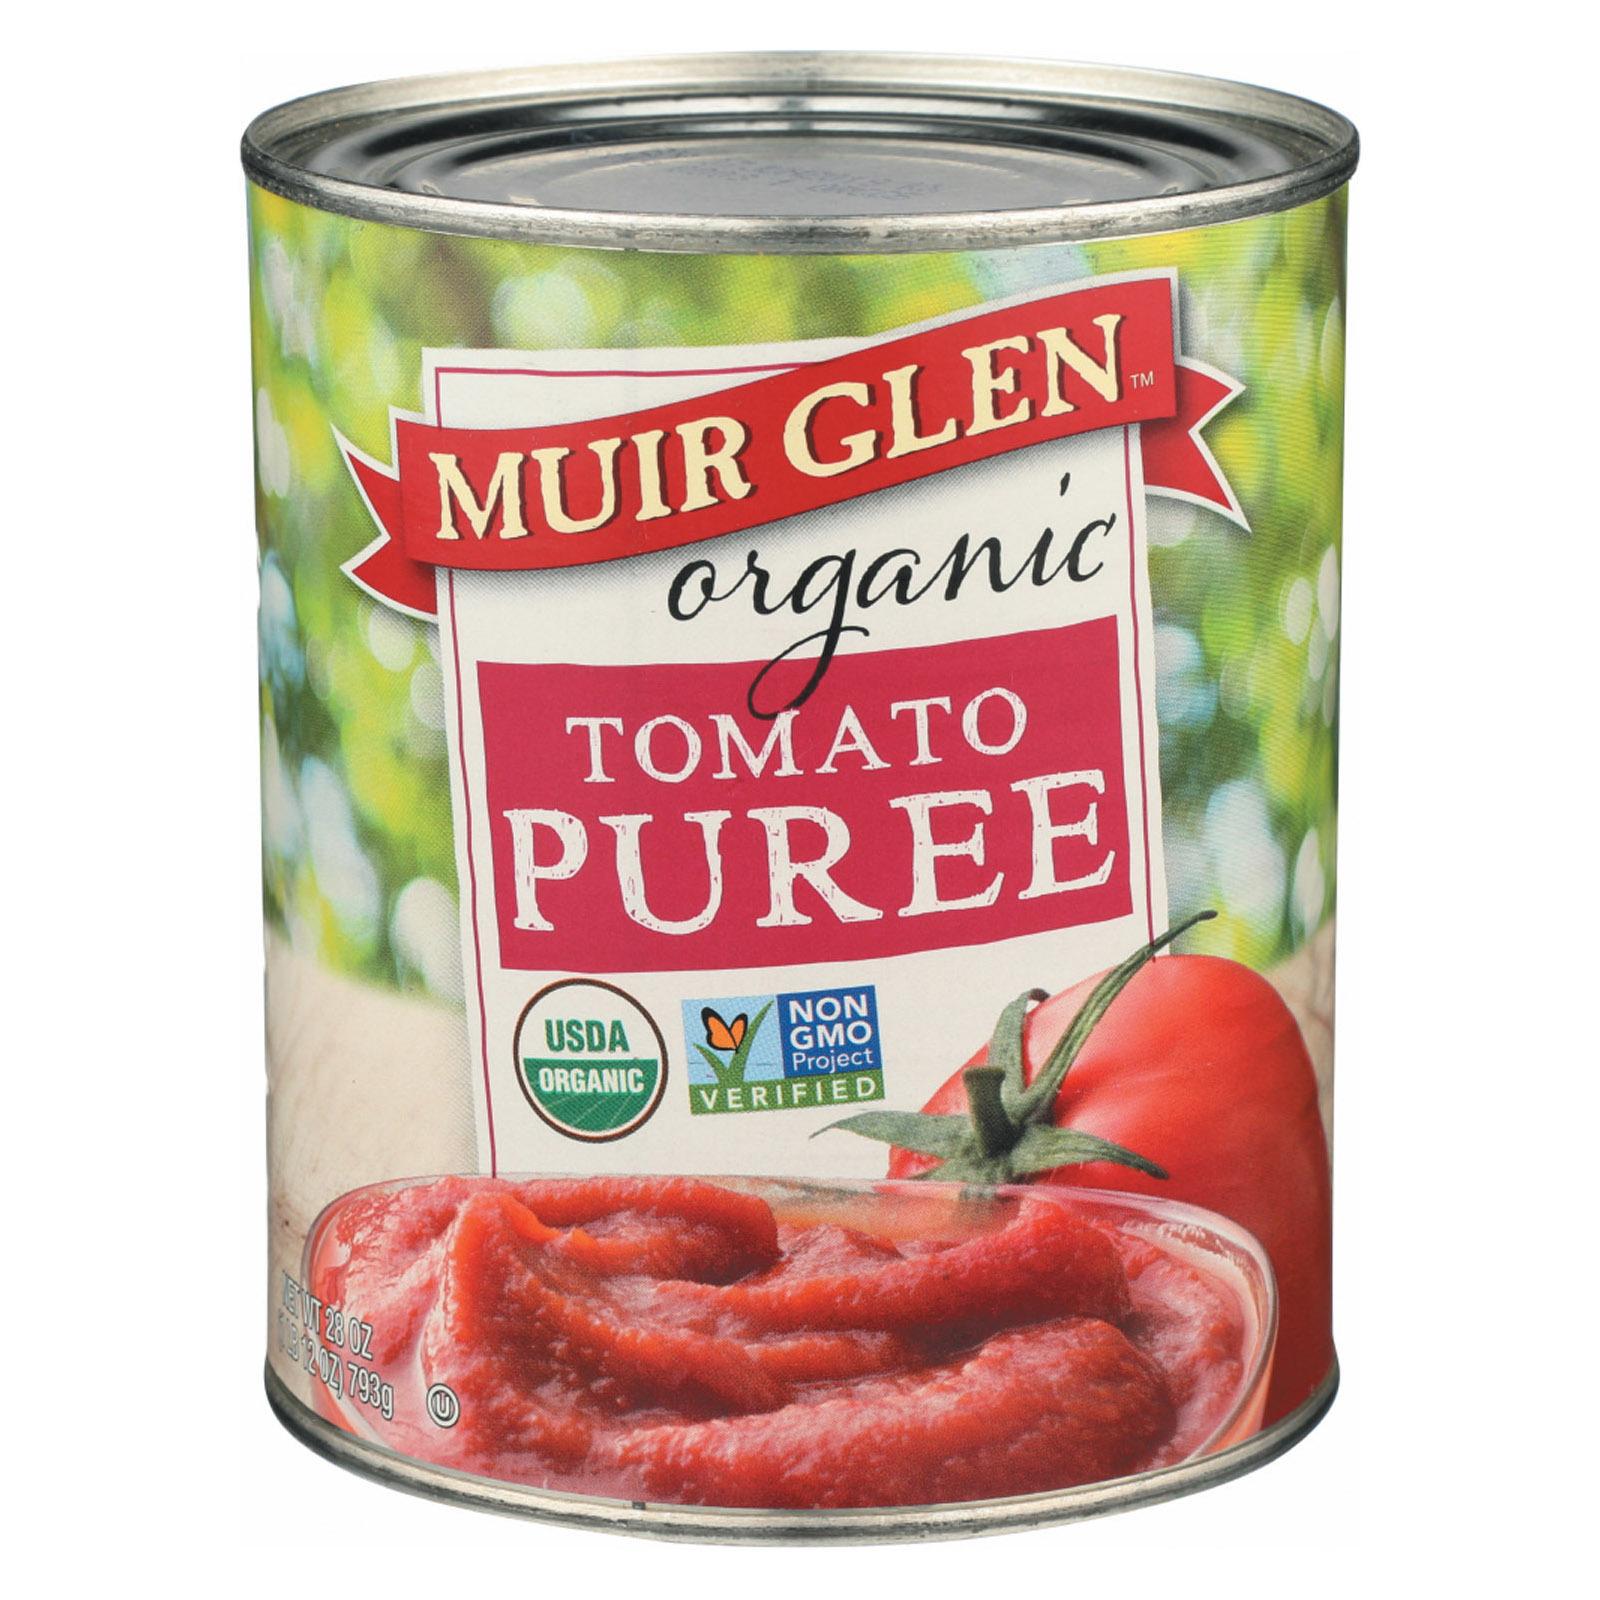 Muir Glen Organic Tomatoes -Puree - 28 oz